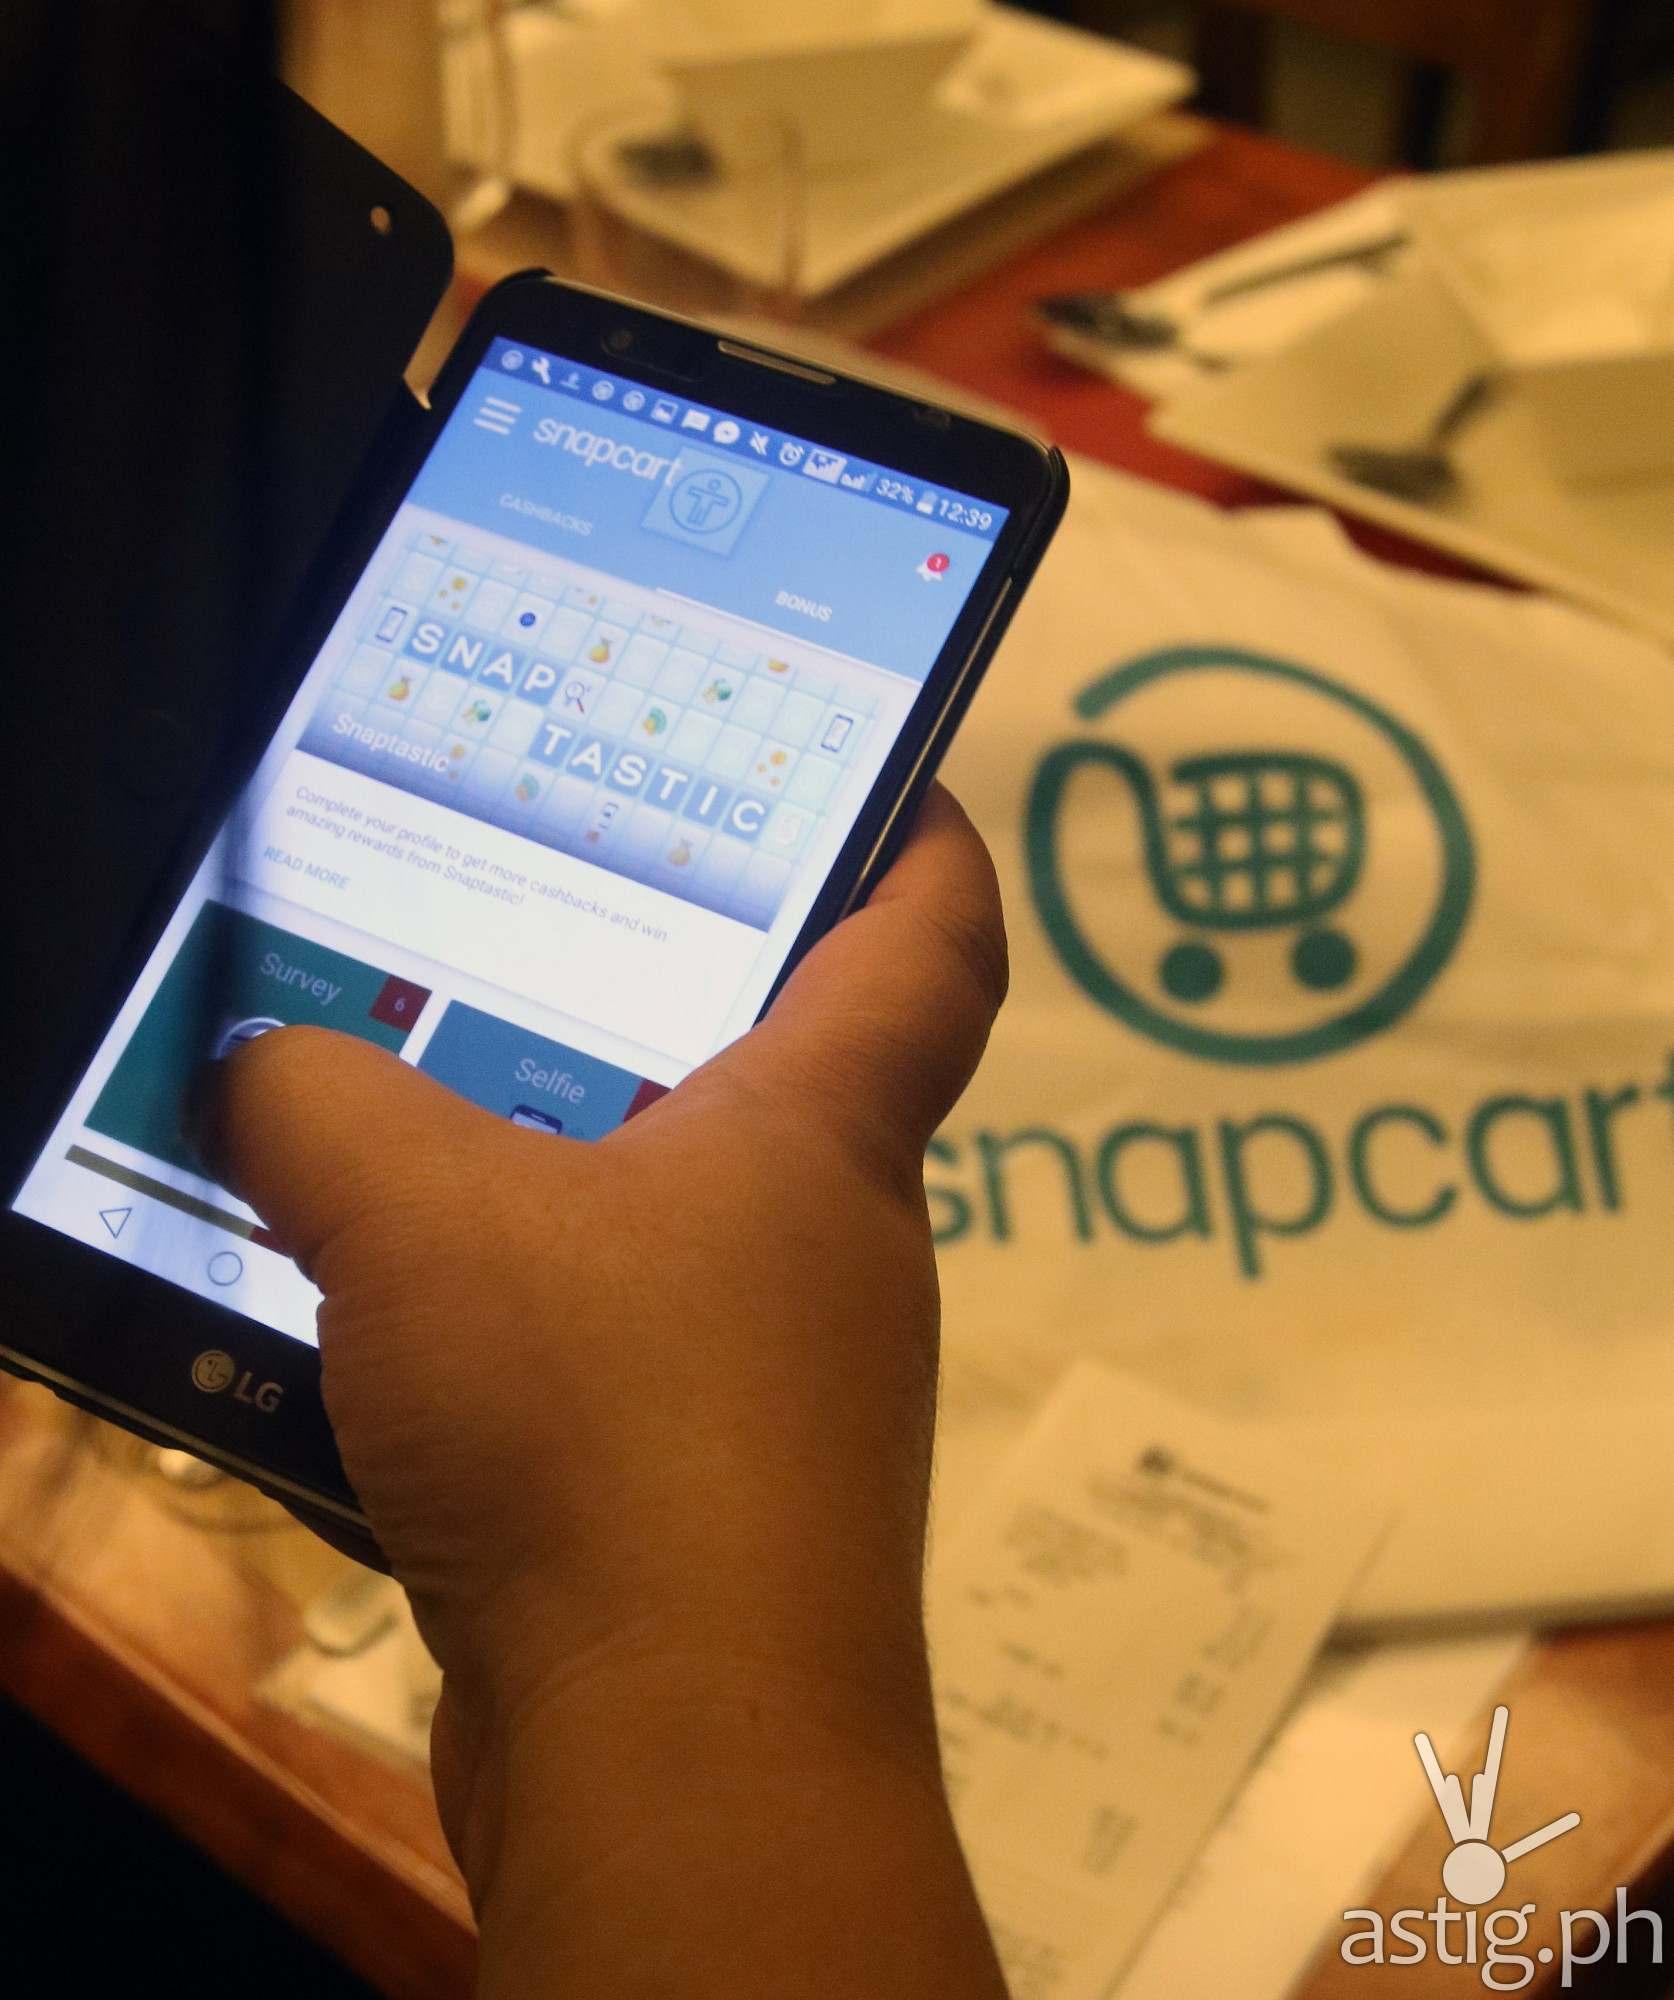 Get cash and rewards with Snapcart | ASTIG PH